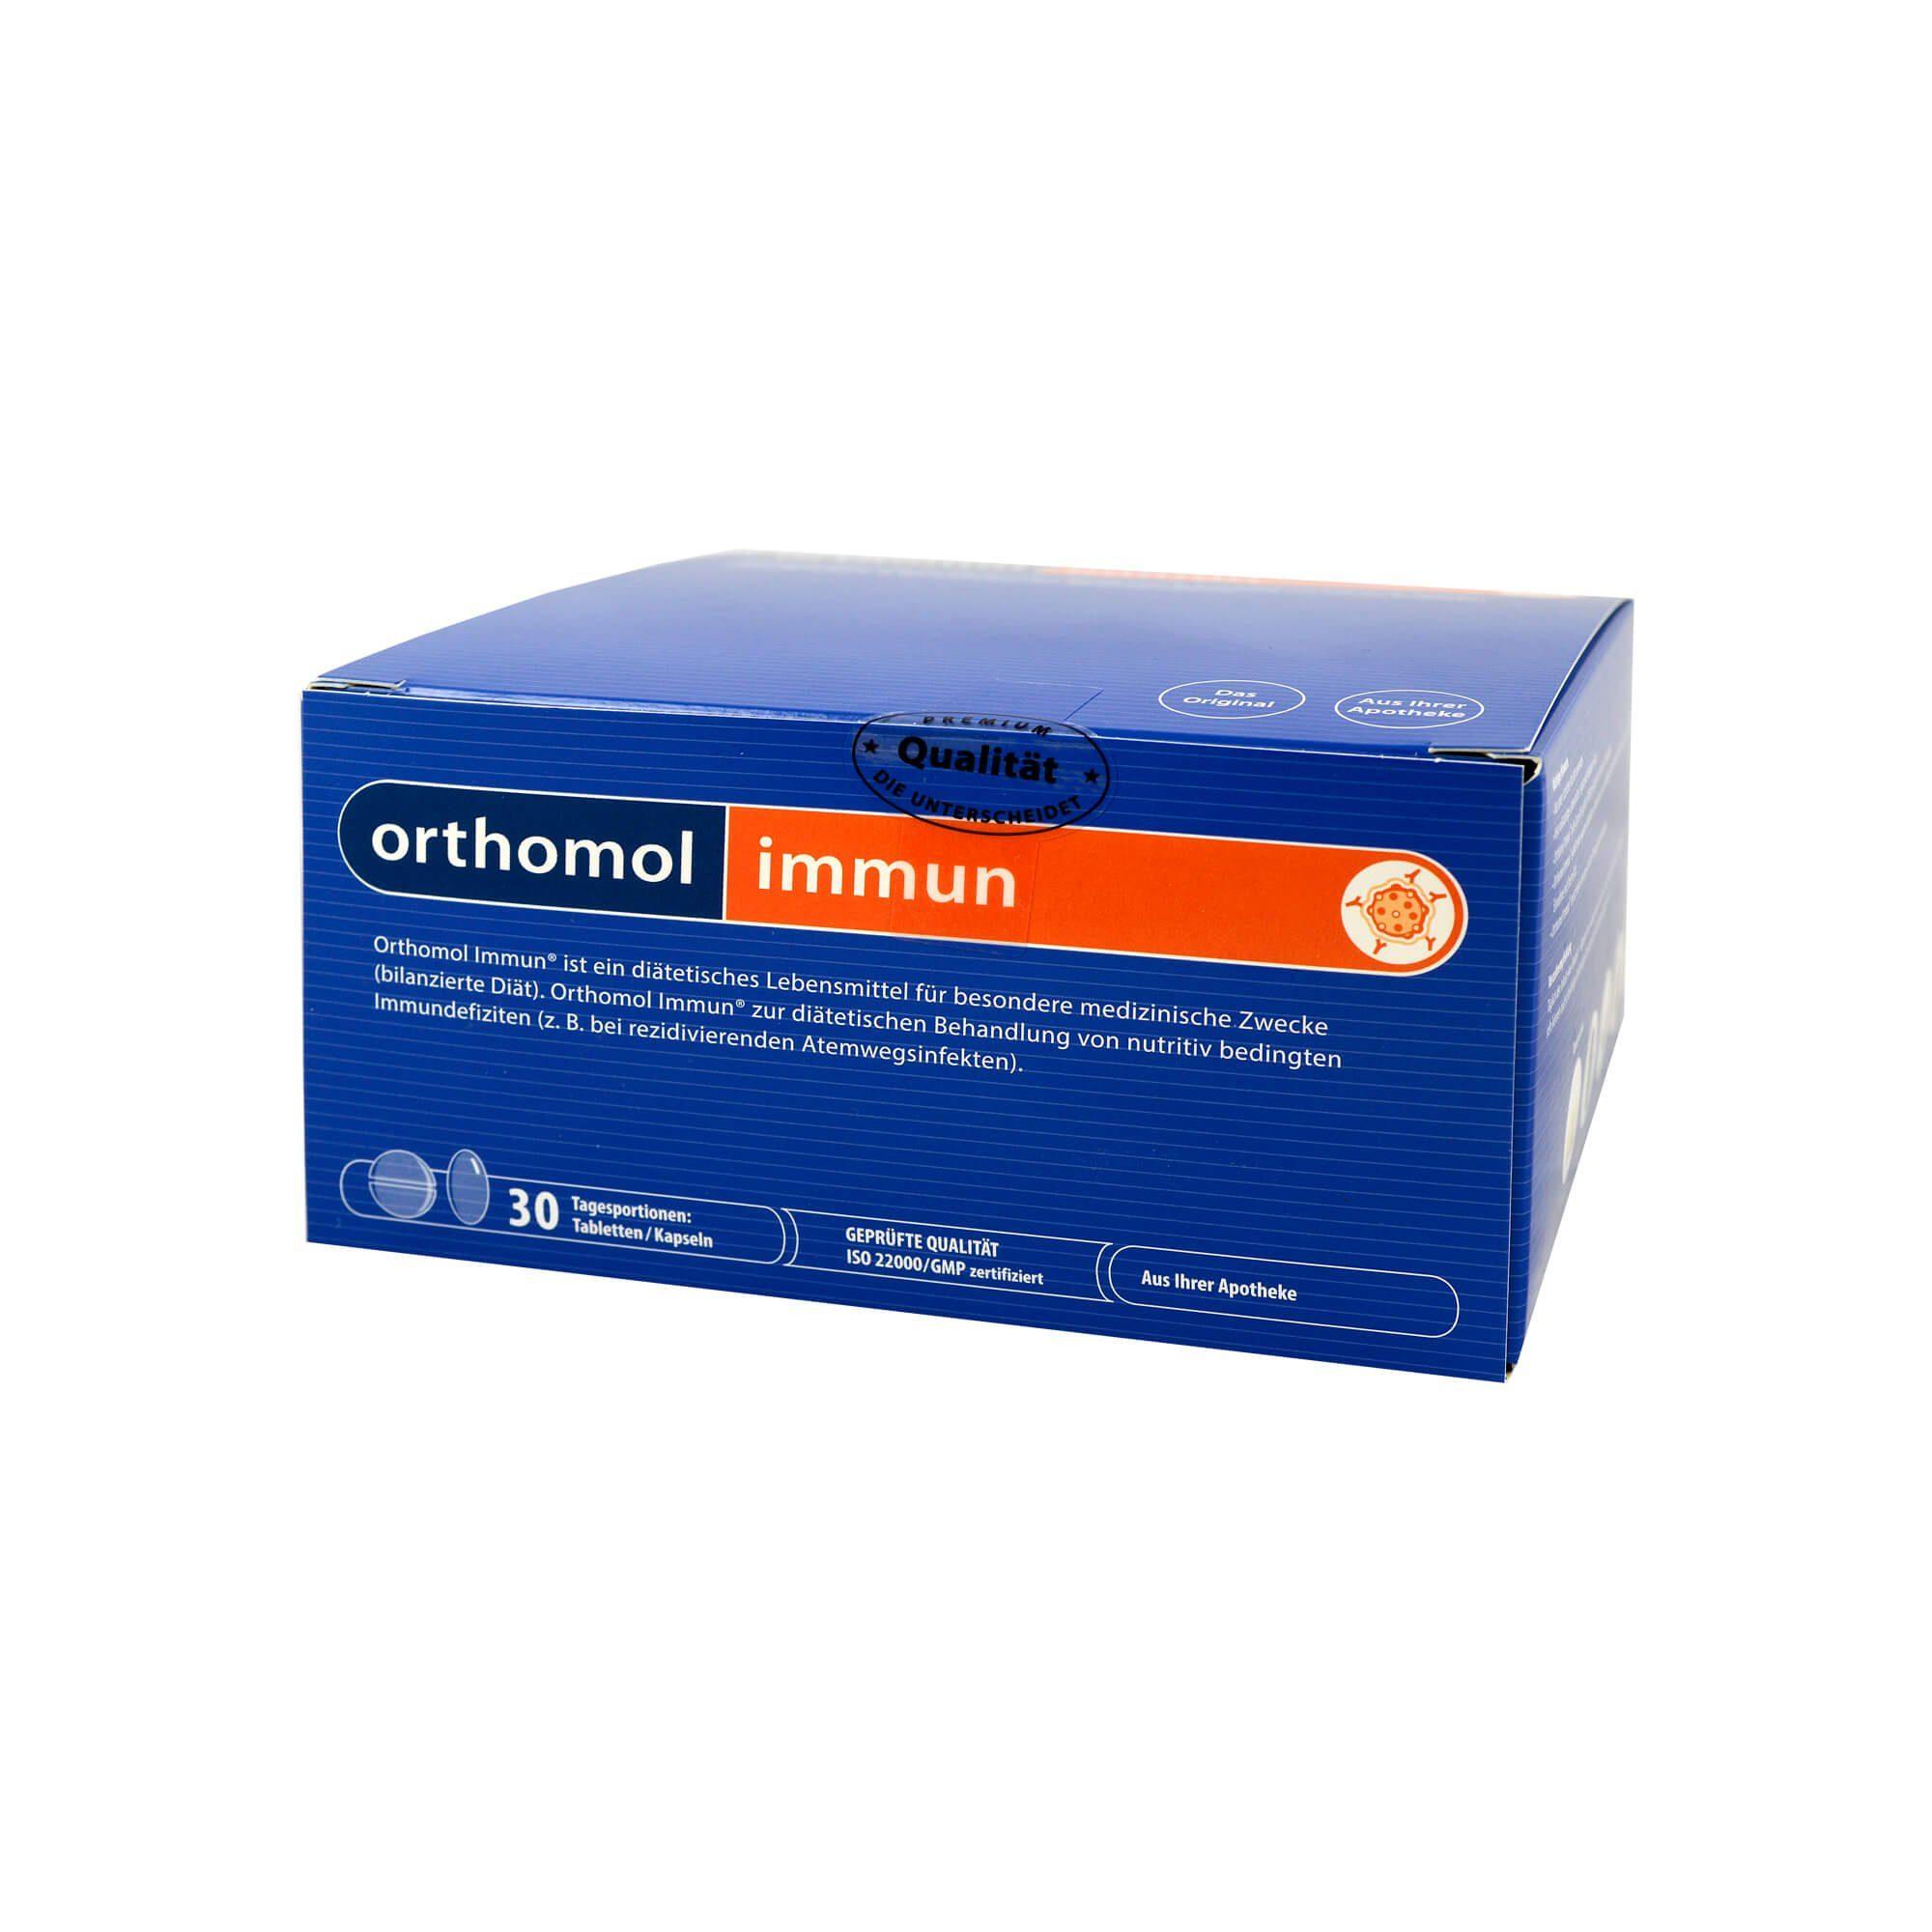 Orthomol Immun 30 Tabletten/Kapseln Kombipackung, 1 St